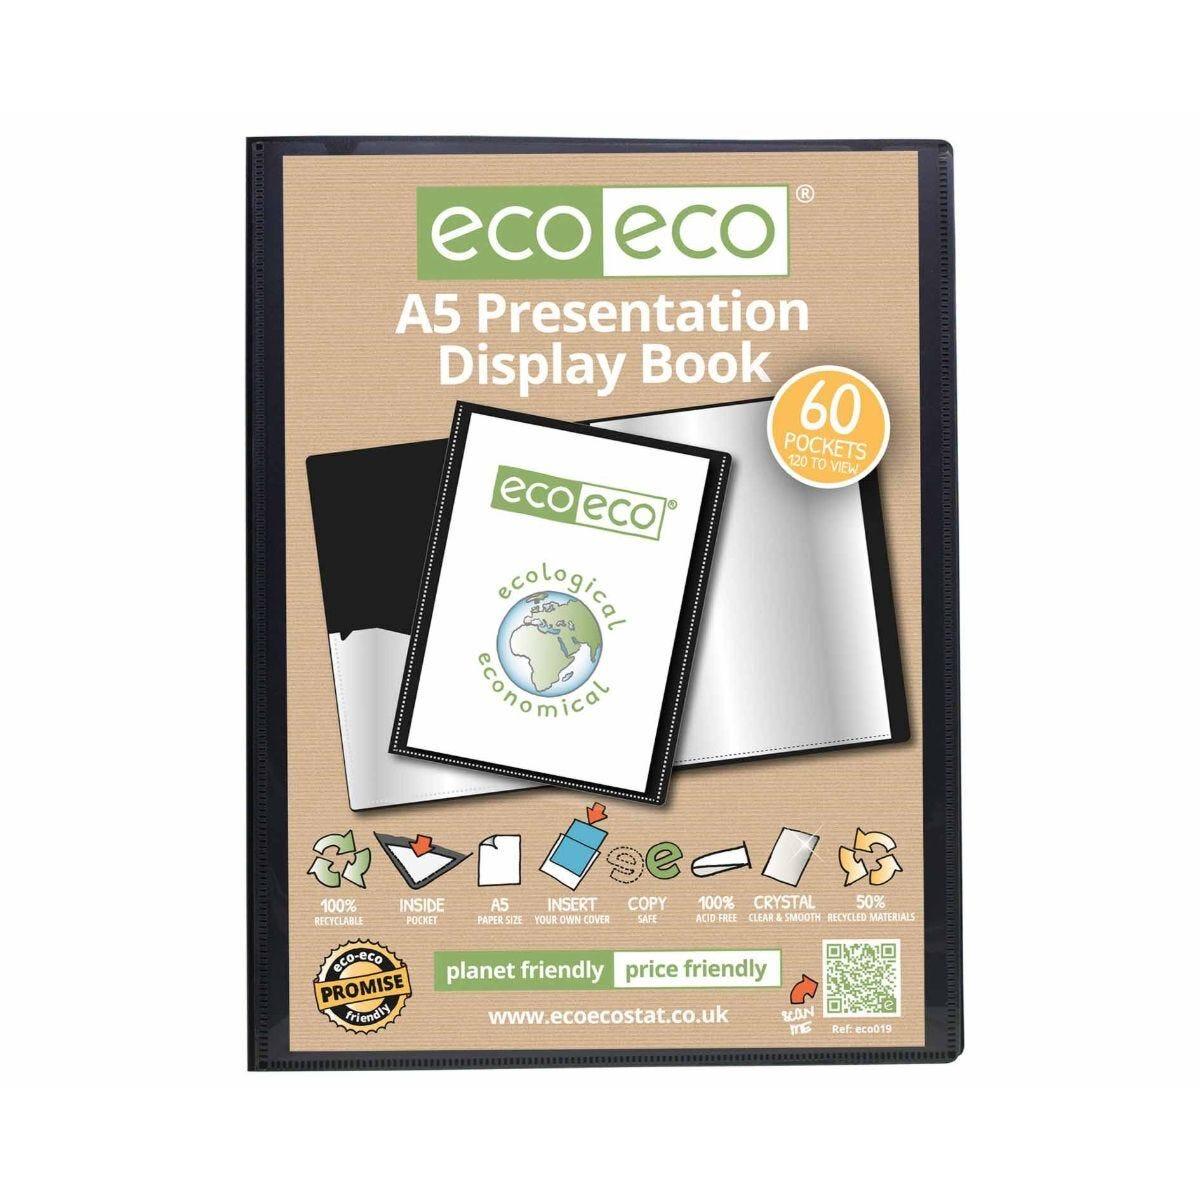 eco eco Presentation Display Book 60 Pocket A5 Black